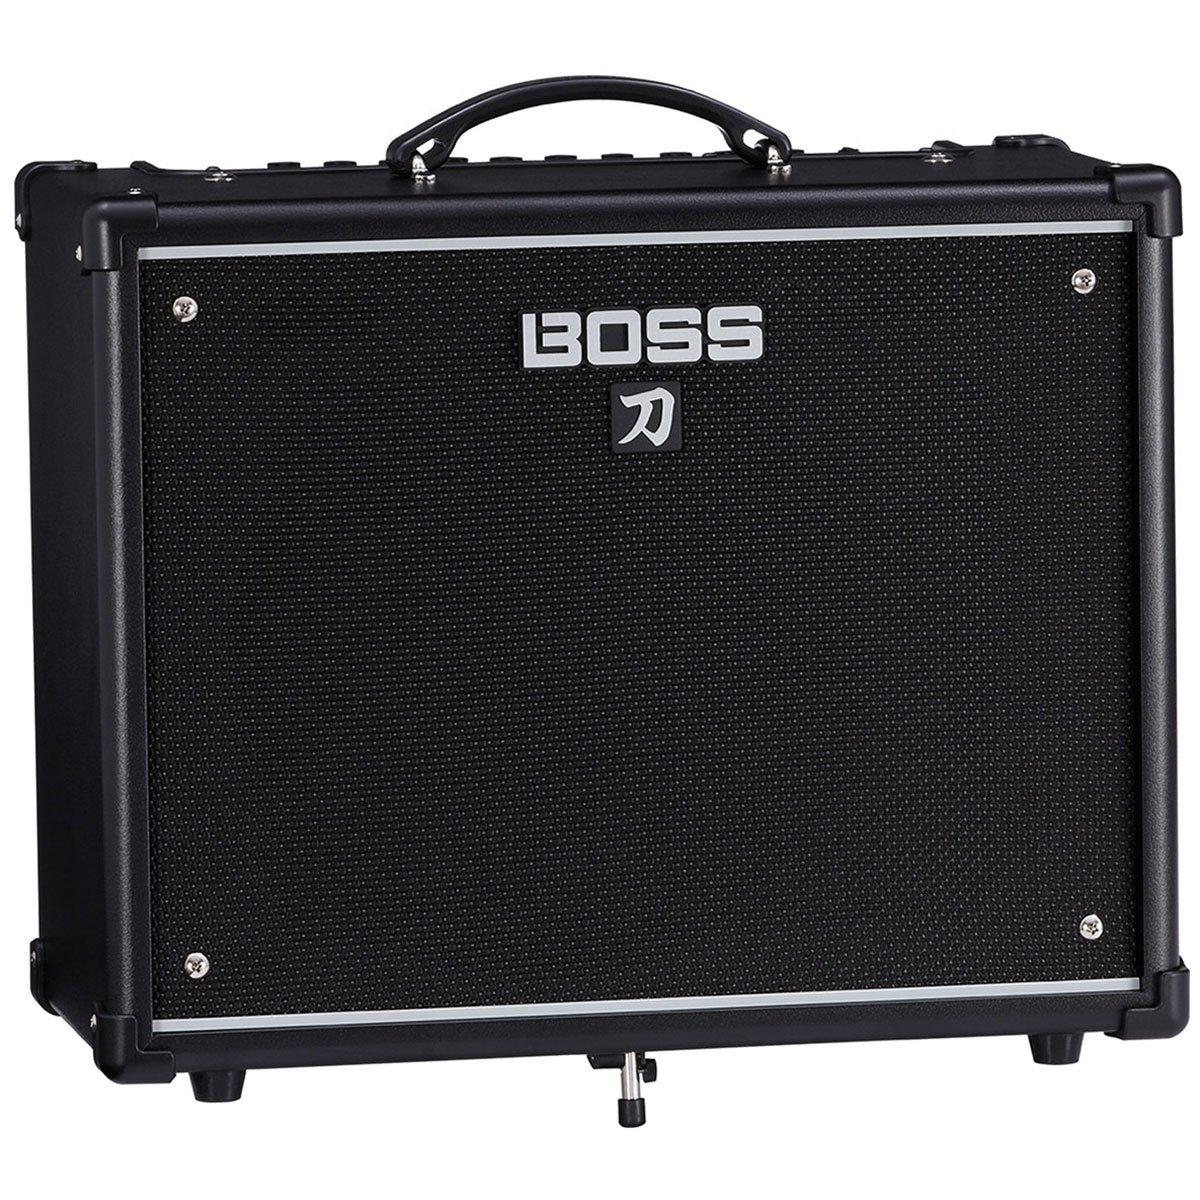 Boss - KTN50 Ampli Guitare Katana 50W